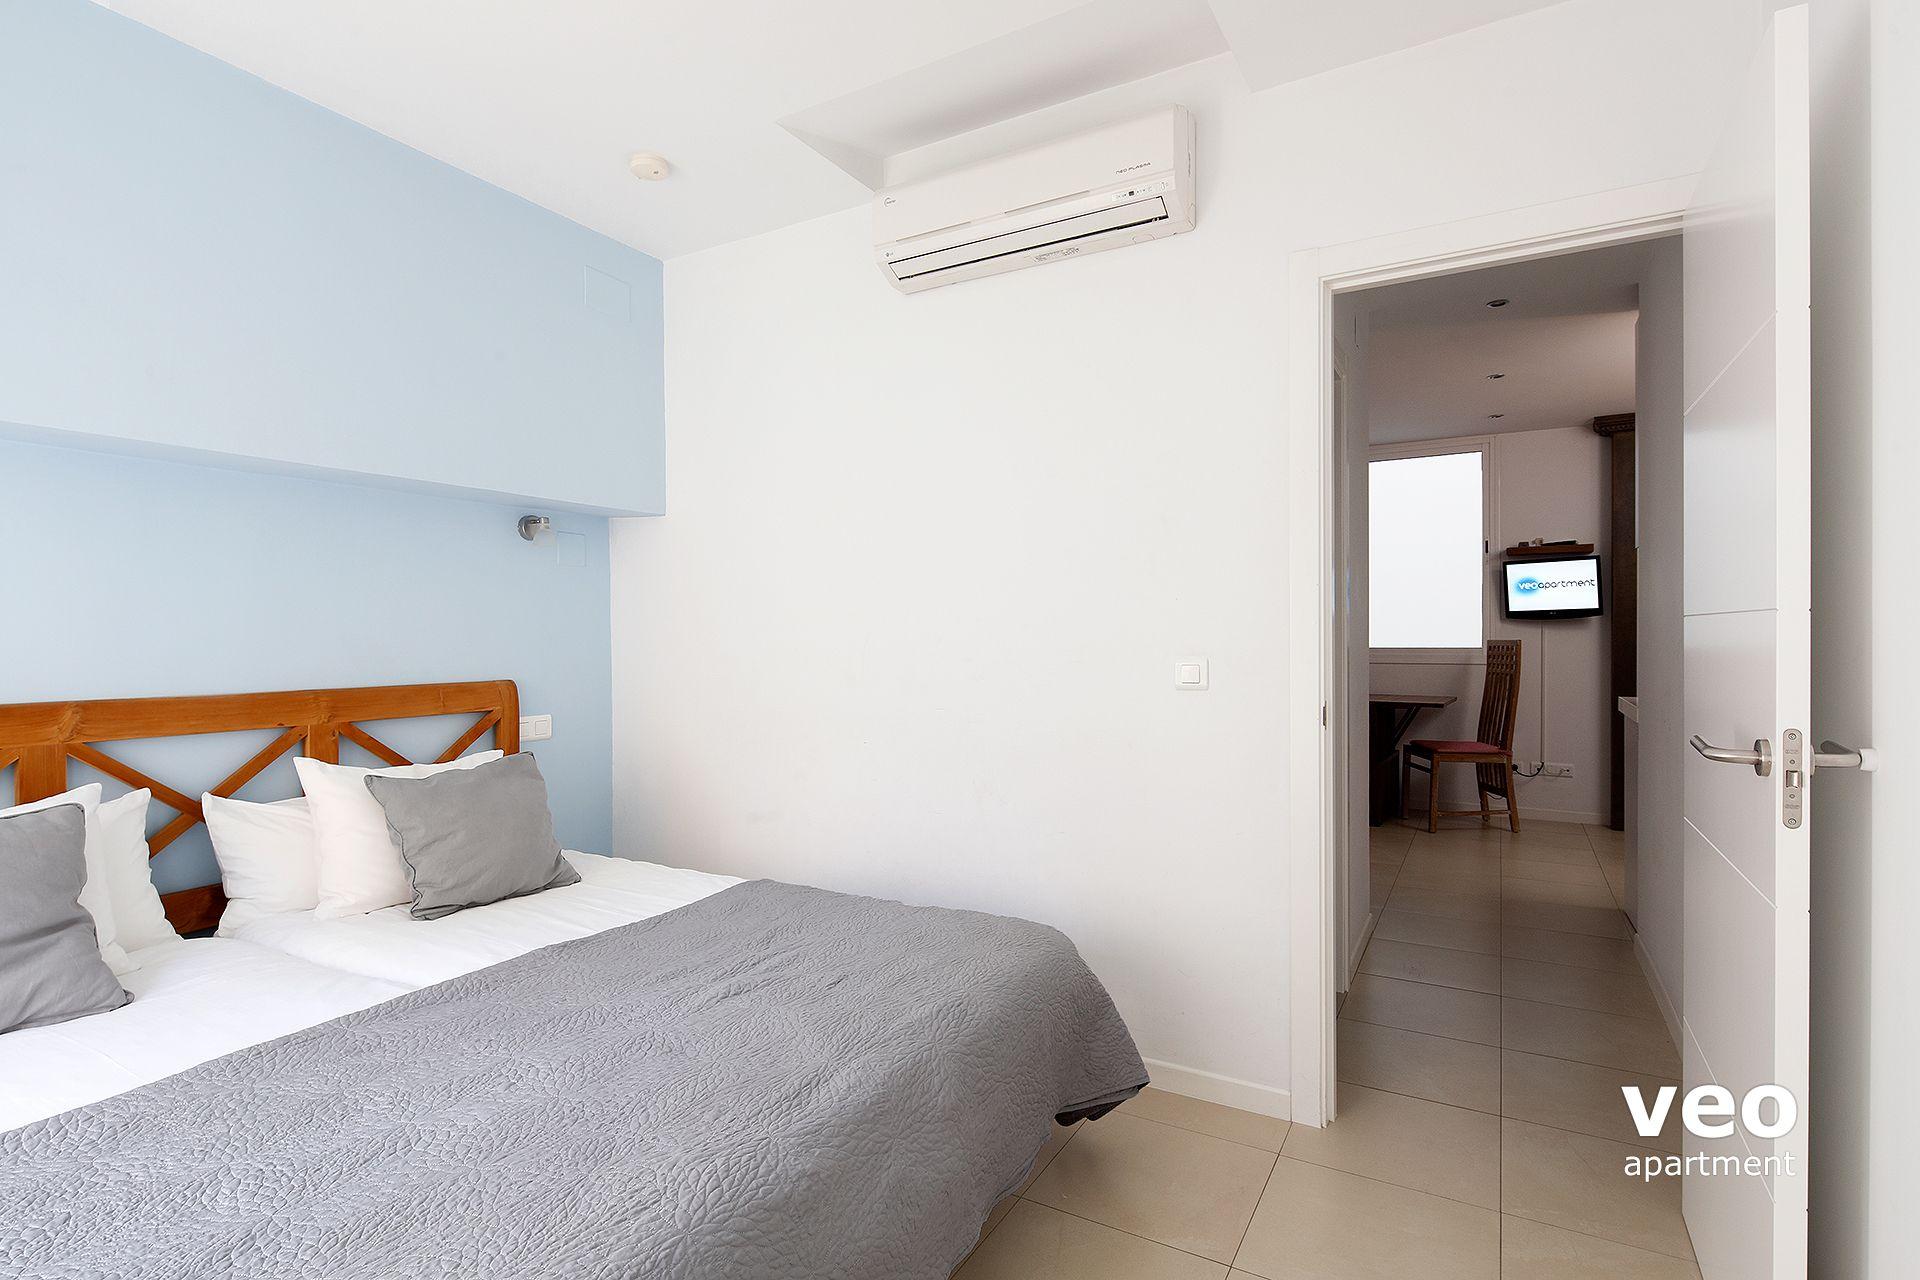 100+ [ Apartment 1a ] | 914 Wynnewood Rd Unit 1a Pelham Ny 10803 Mls 4607268 Redfin,610 660 ...